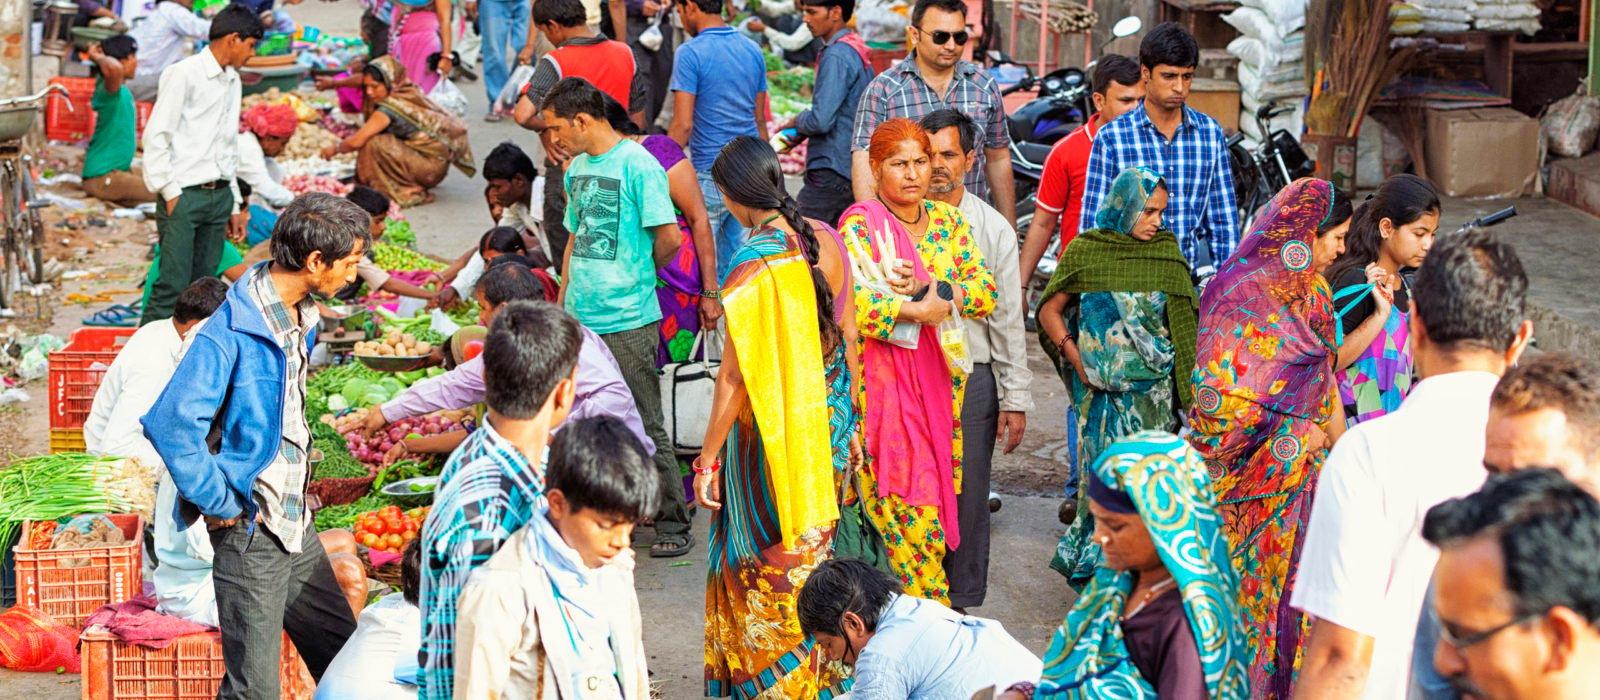 market-people-jaipur-rajasthan-india